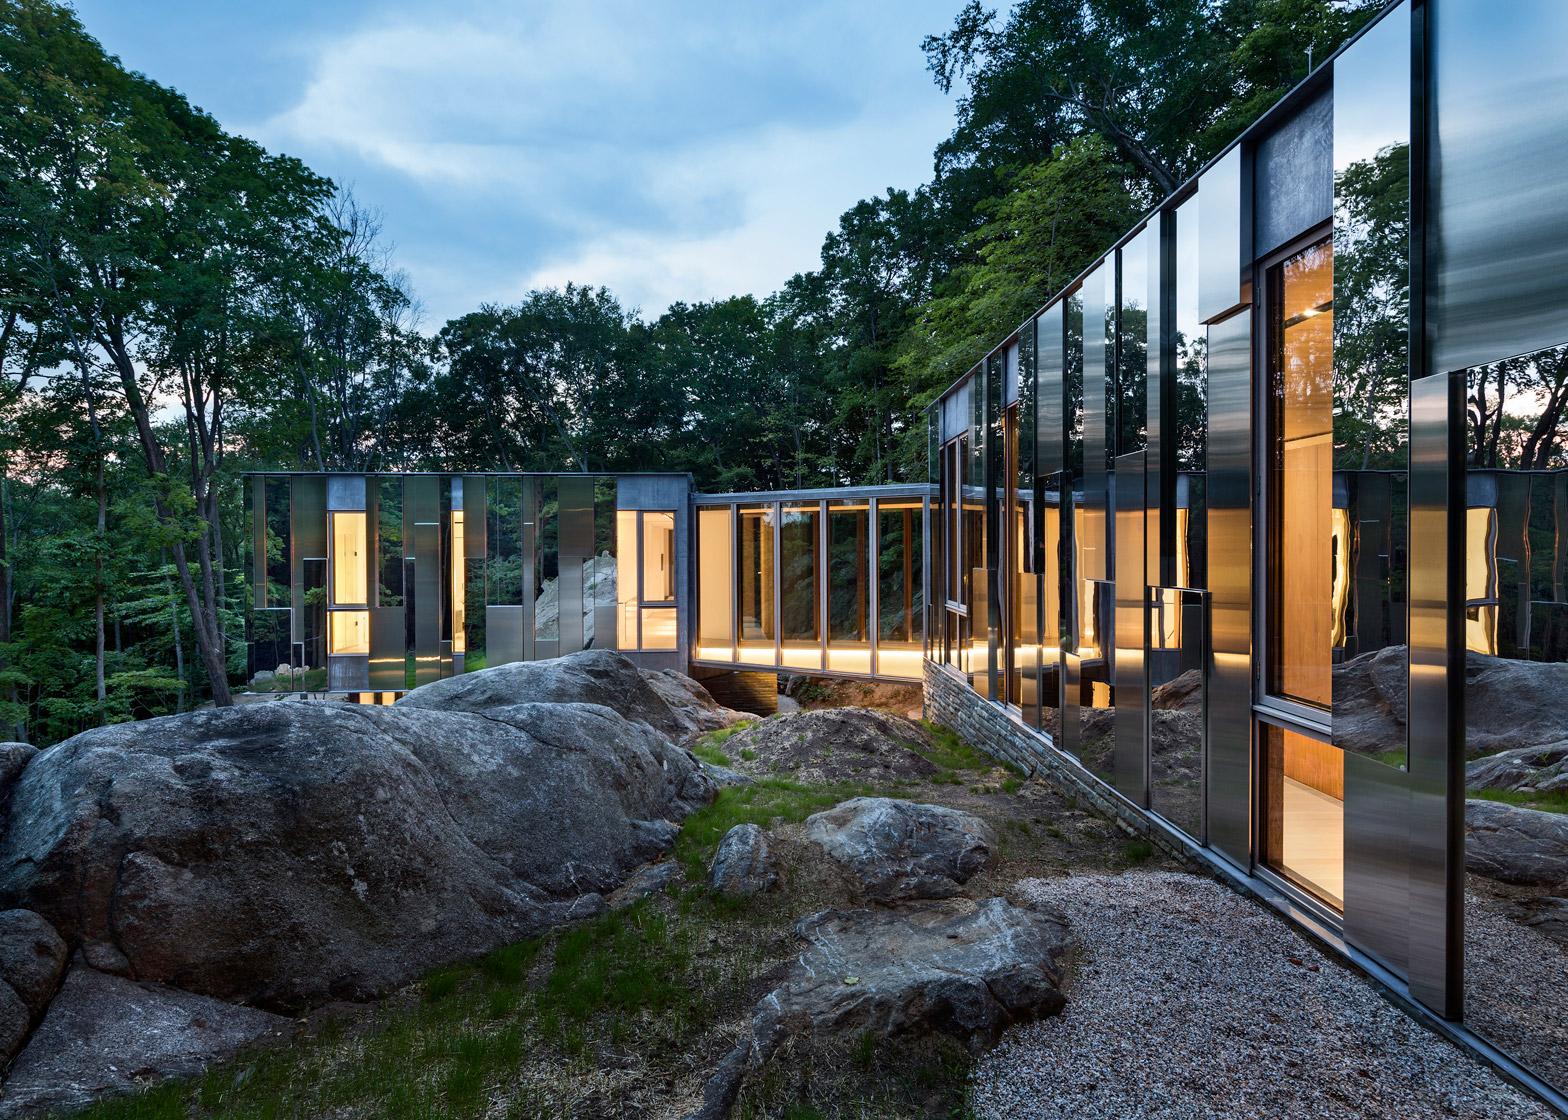 Pound Ridge House by KieranTimberlake